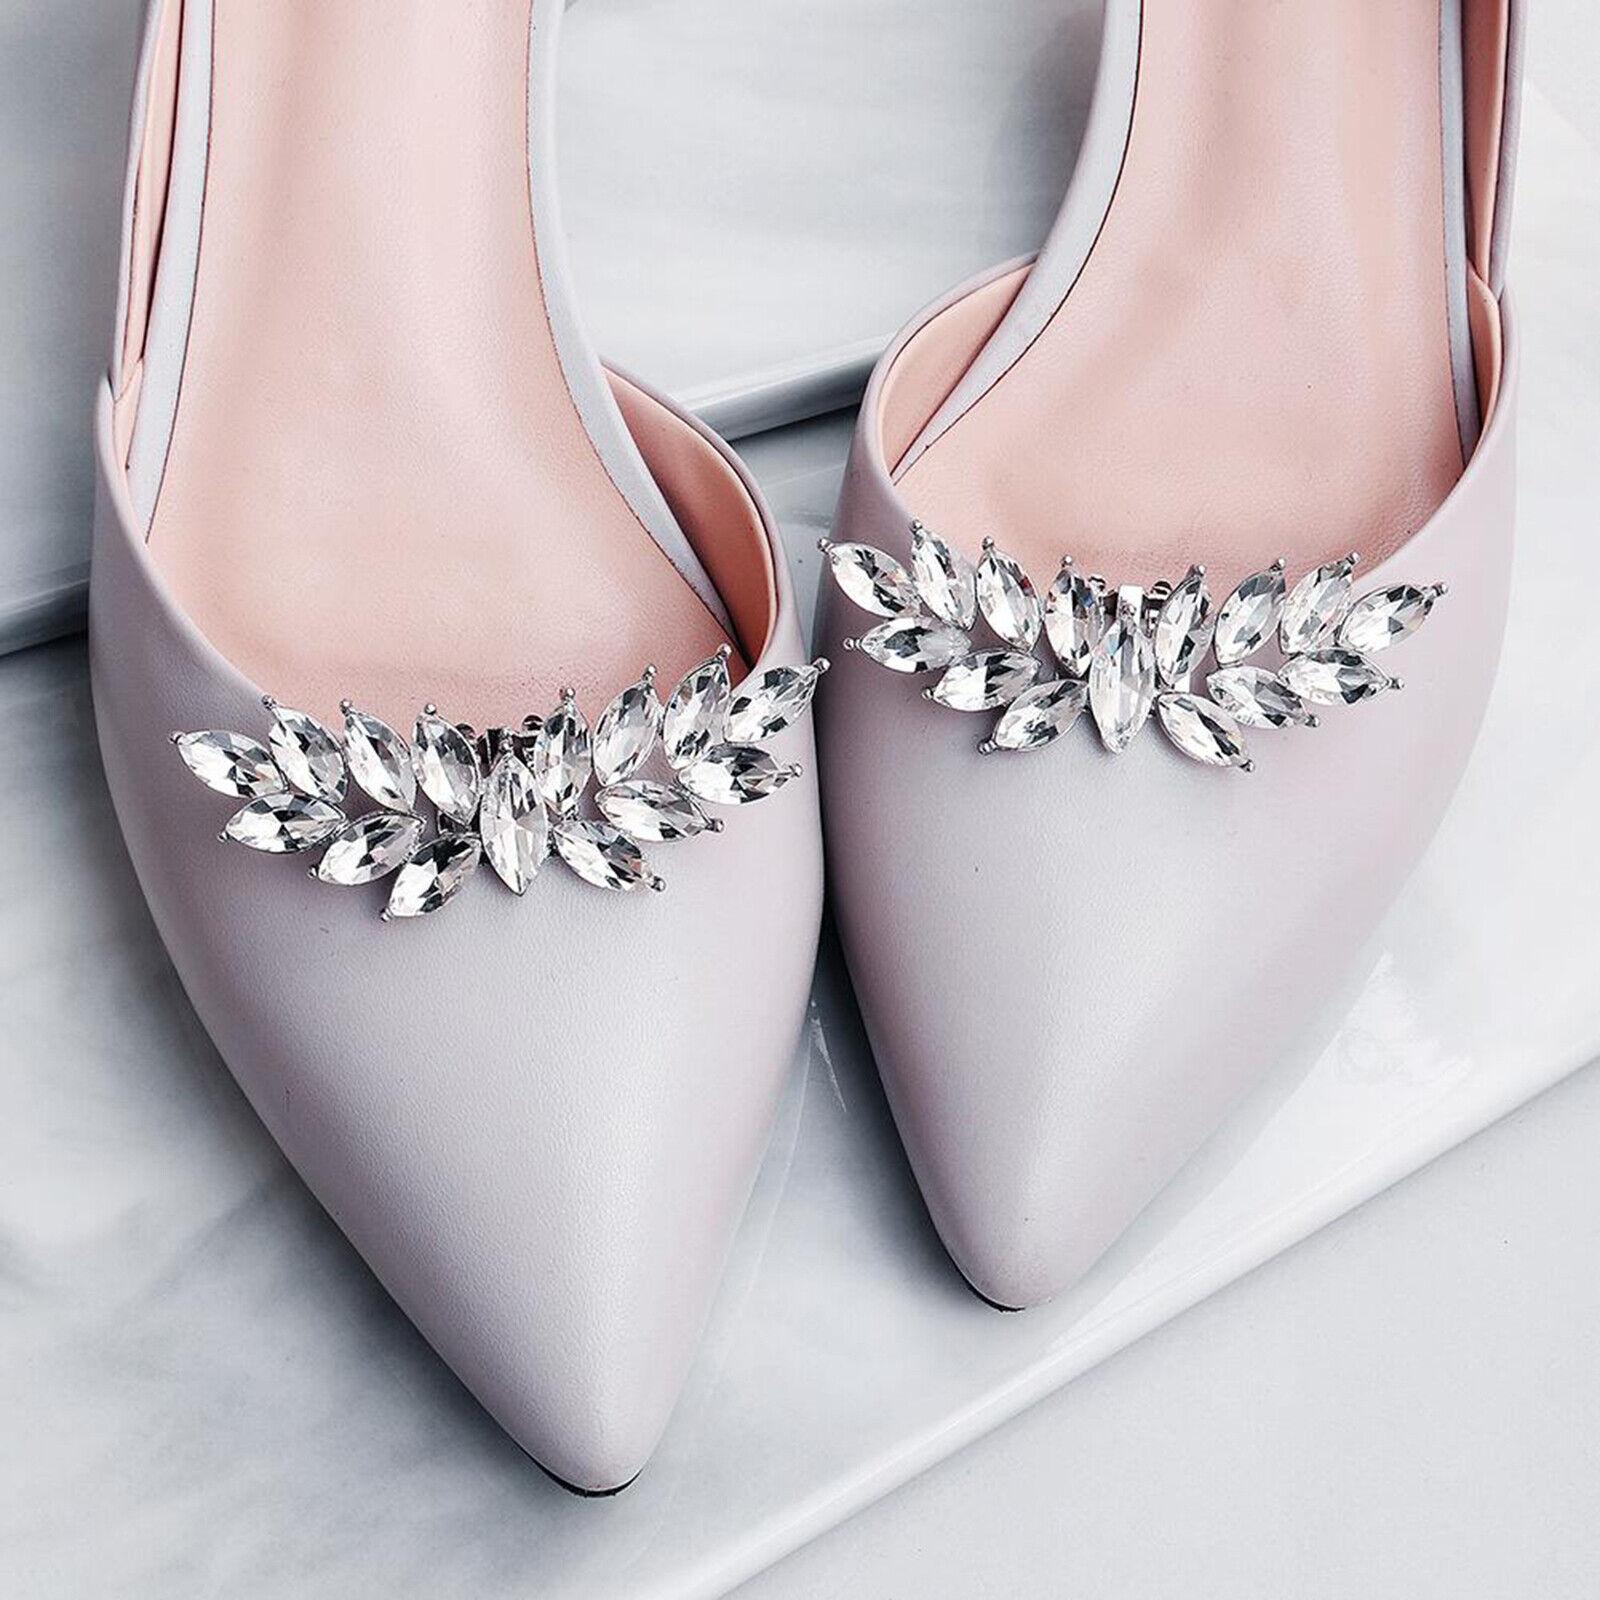 2Pcs Rhinestone Applique Shoe Clips Charms for DIY Wedding Dress Shoes Bridal